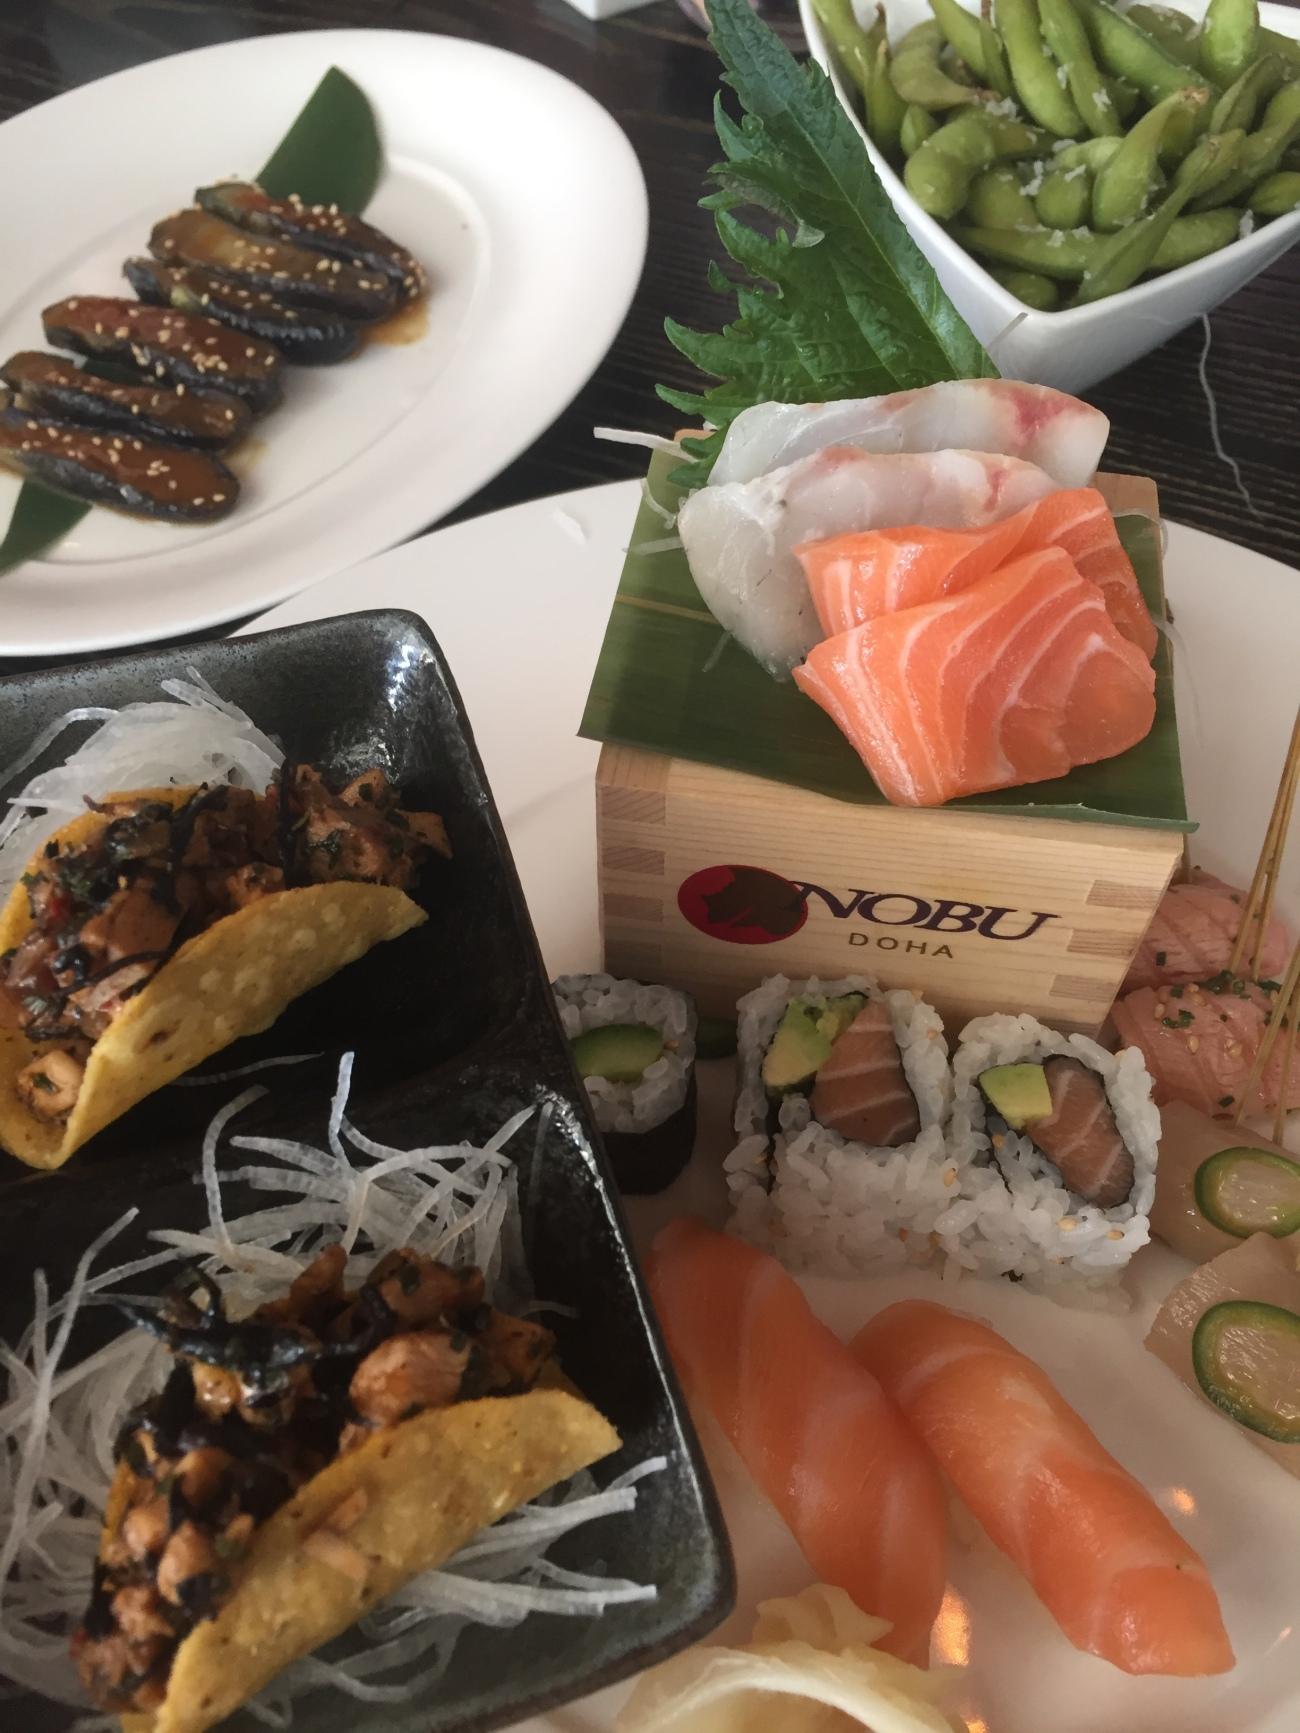 Nobu doha food blog